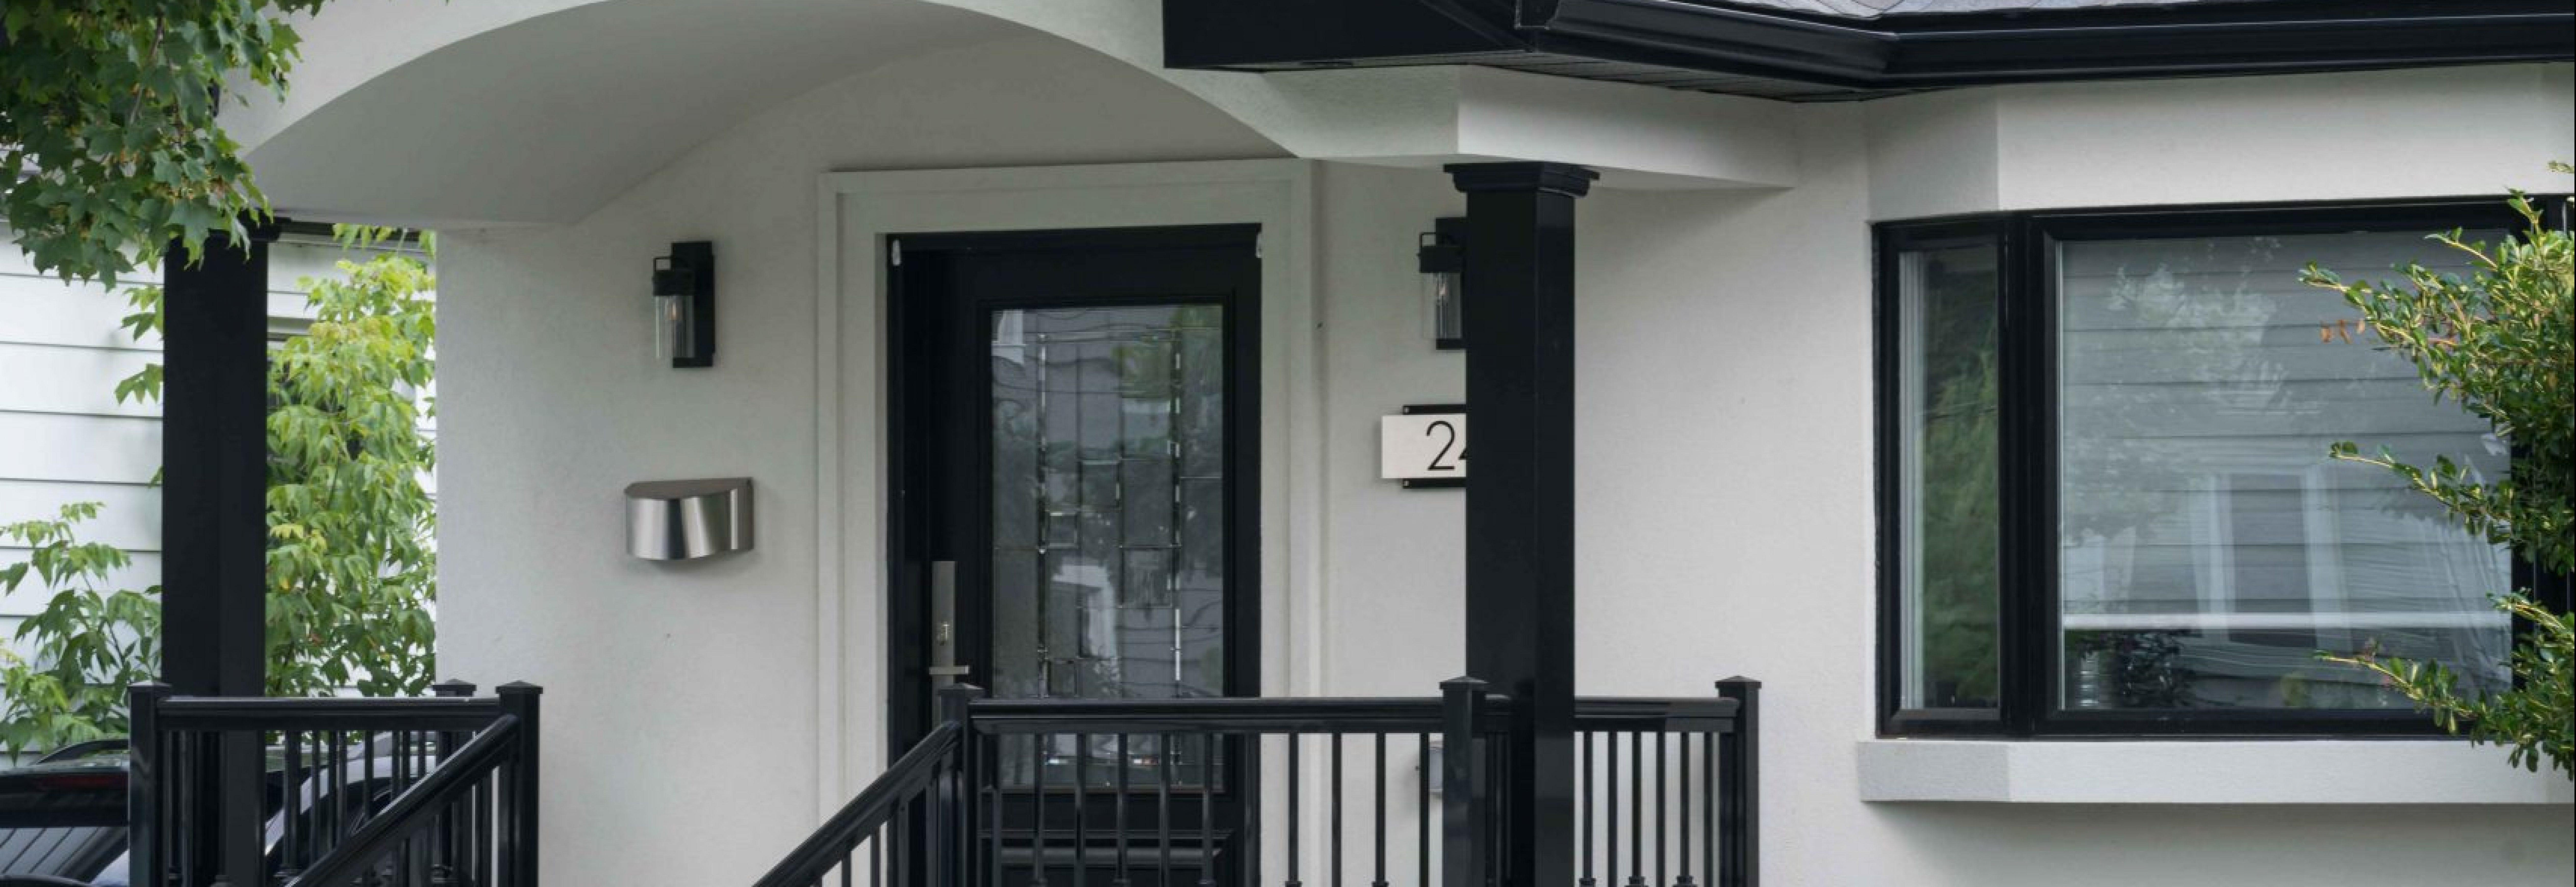 Right side - Exterior stucco home near Acorn Ave, Etobicoke, TOronto, Ontario Sky Stucco Systems